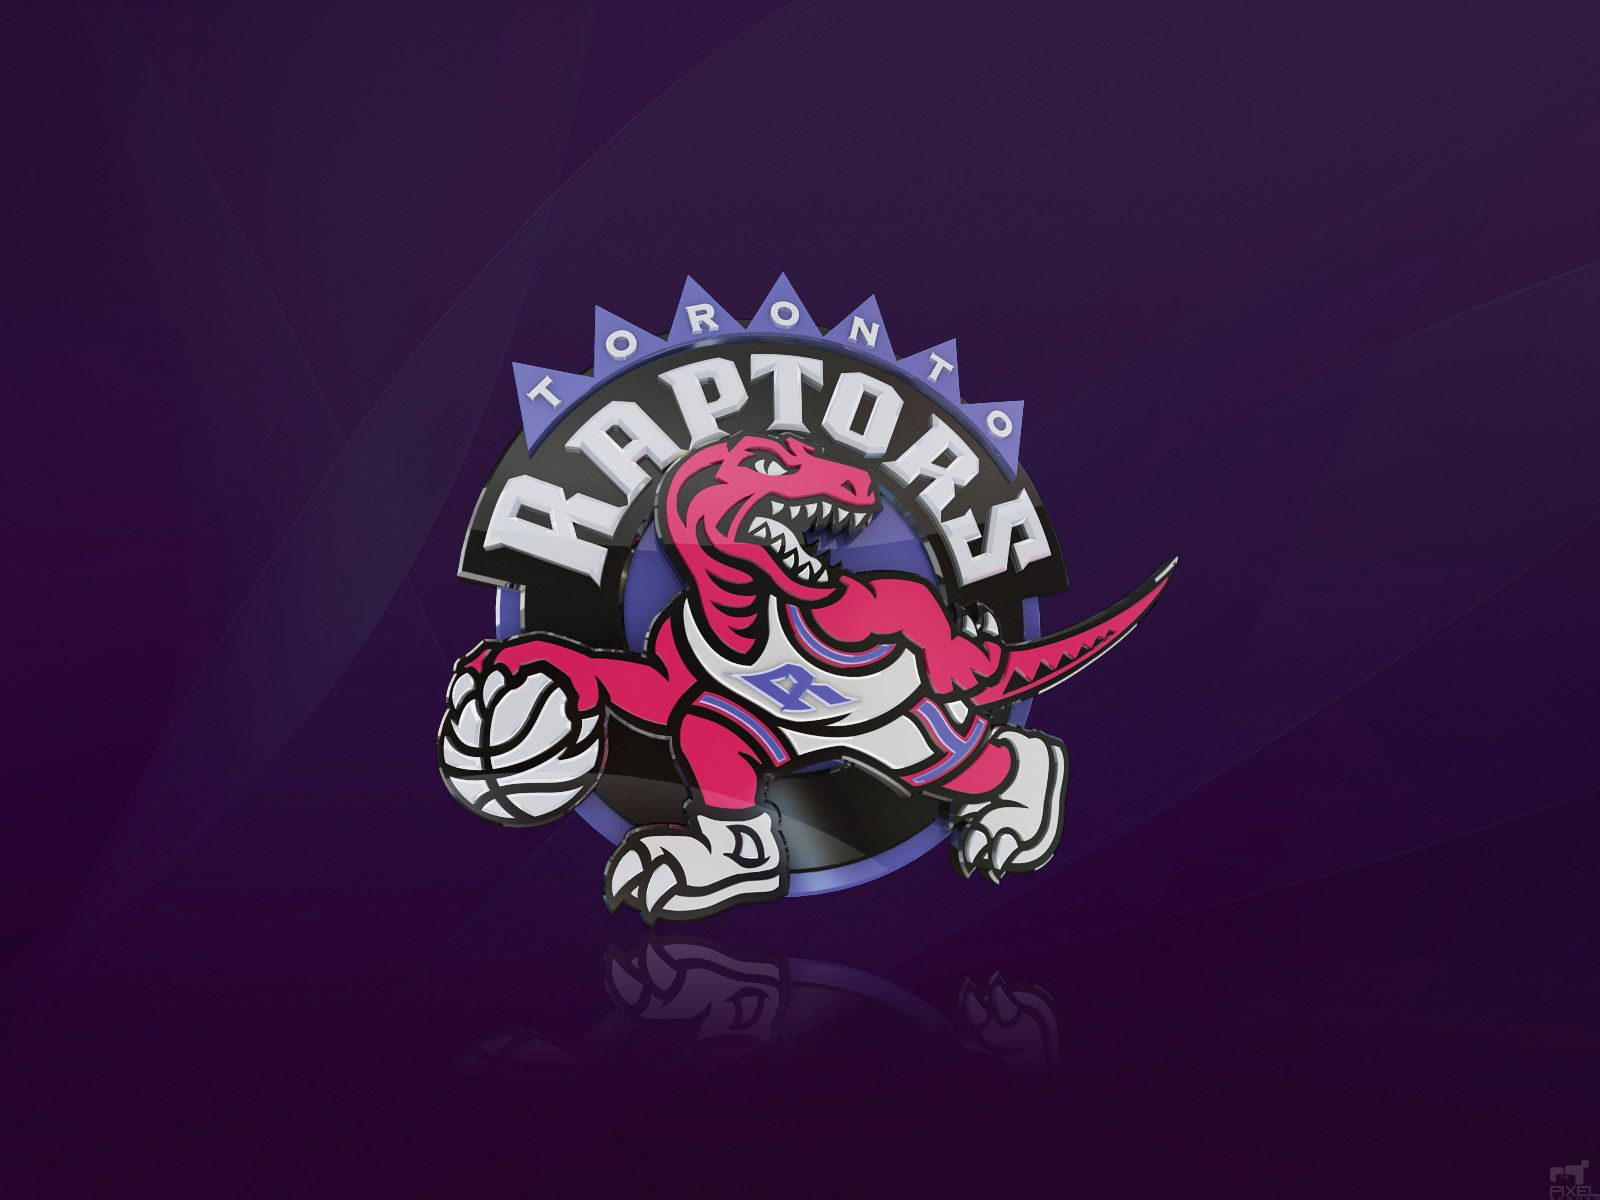 Toronto Raptors Photo Raptors Basketball Toronto Raptors Toronto Raptors Basketball